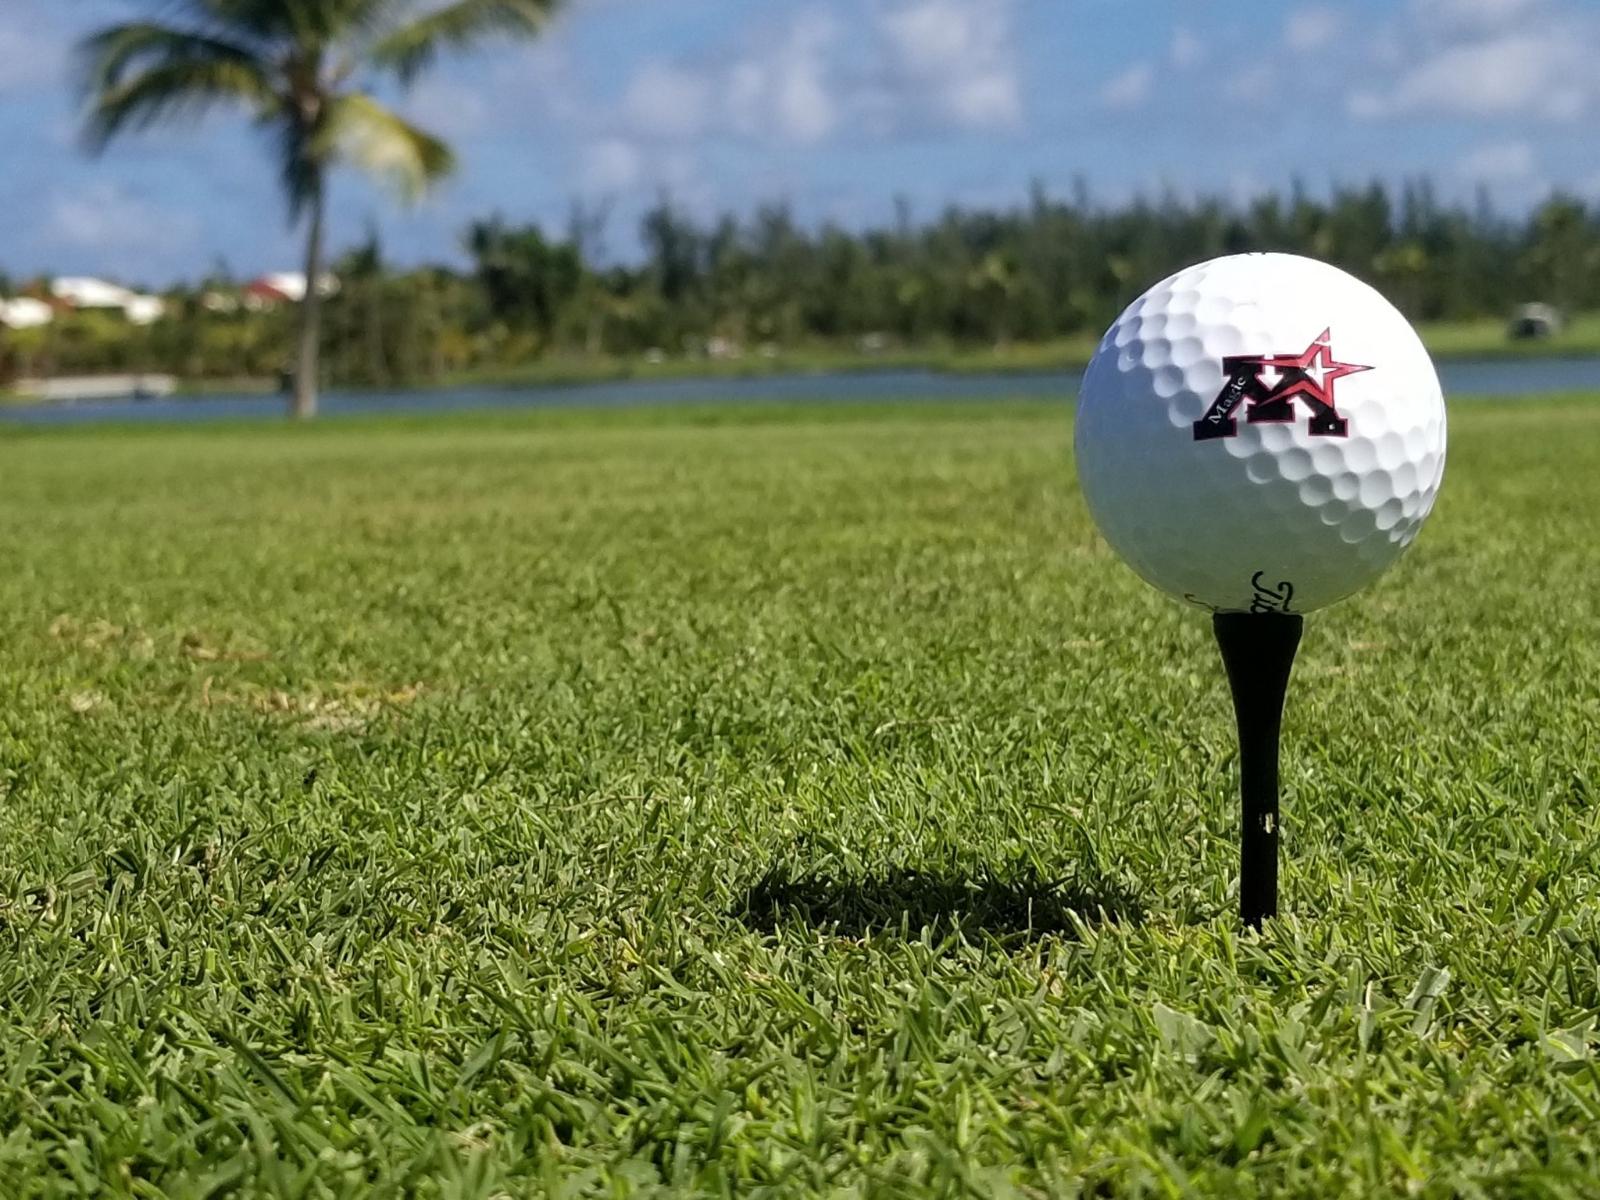 11th Annual Monticello High School Golf Scramble is August 10th, 2020!